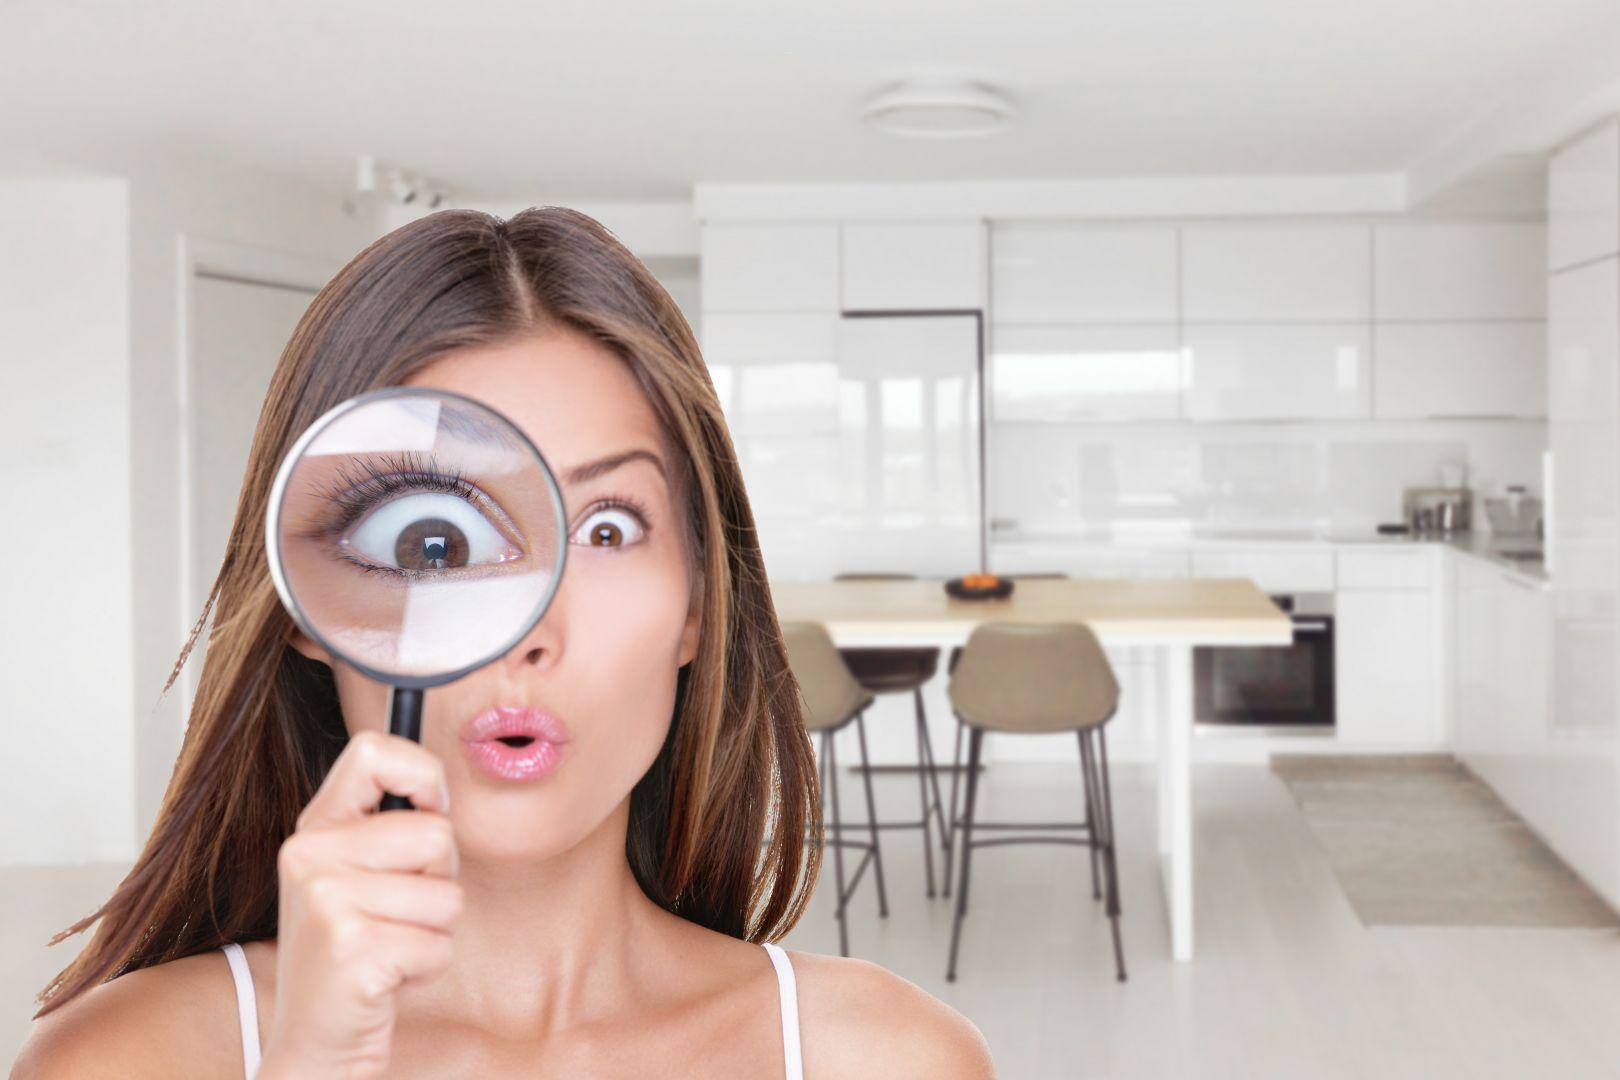 Homelyoo devient le 1er chasseur immobilier 100% au forfait